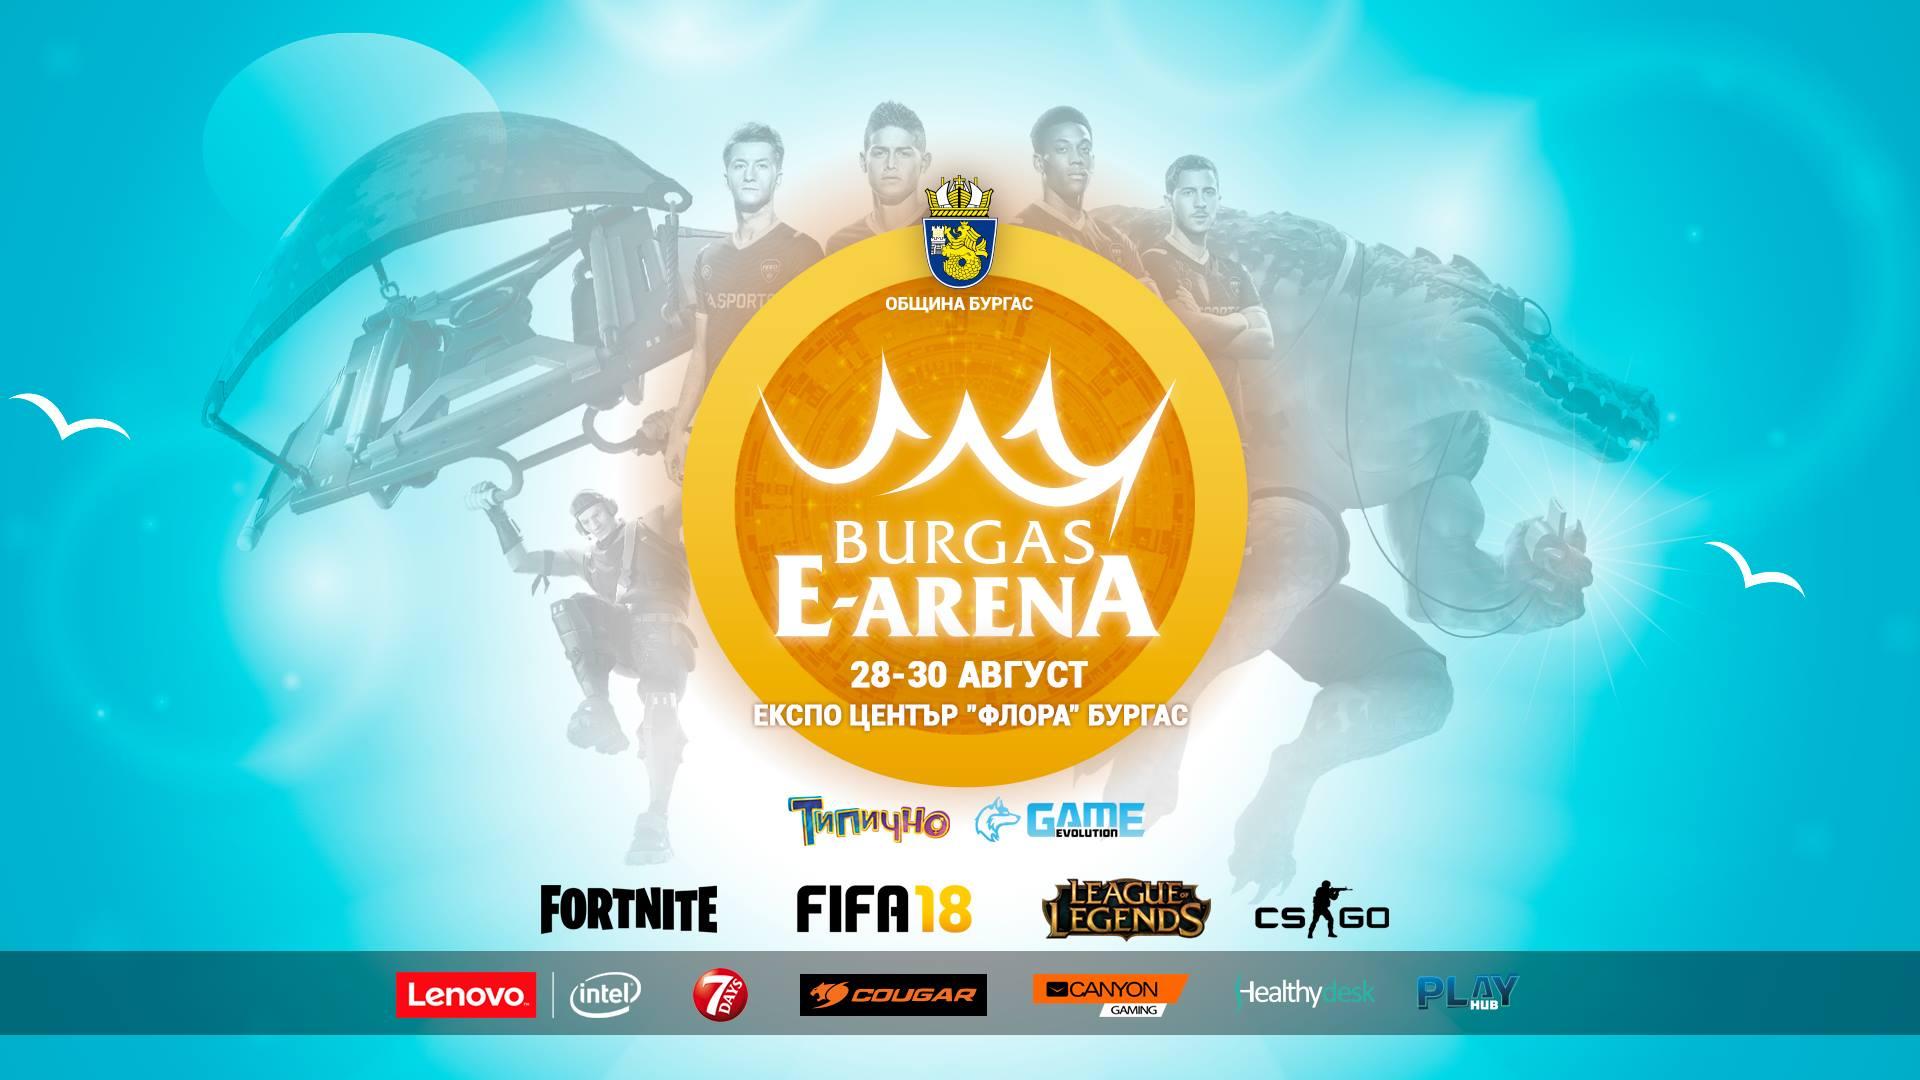 Гейминг фестивала E-Arena идва в Бургас